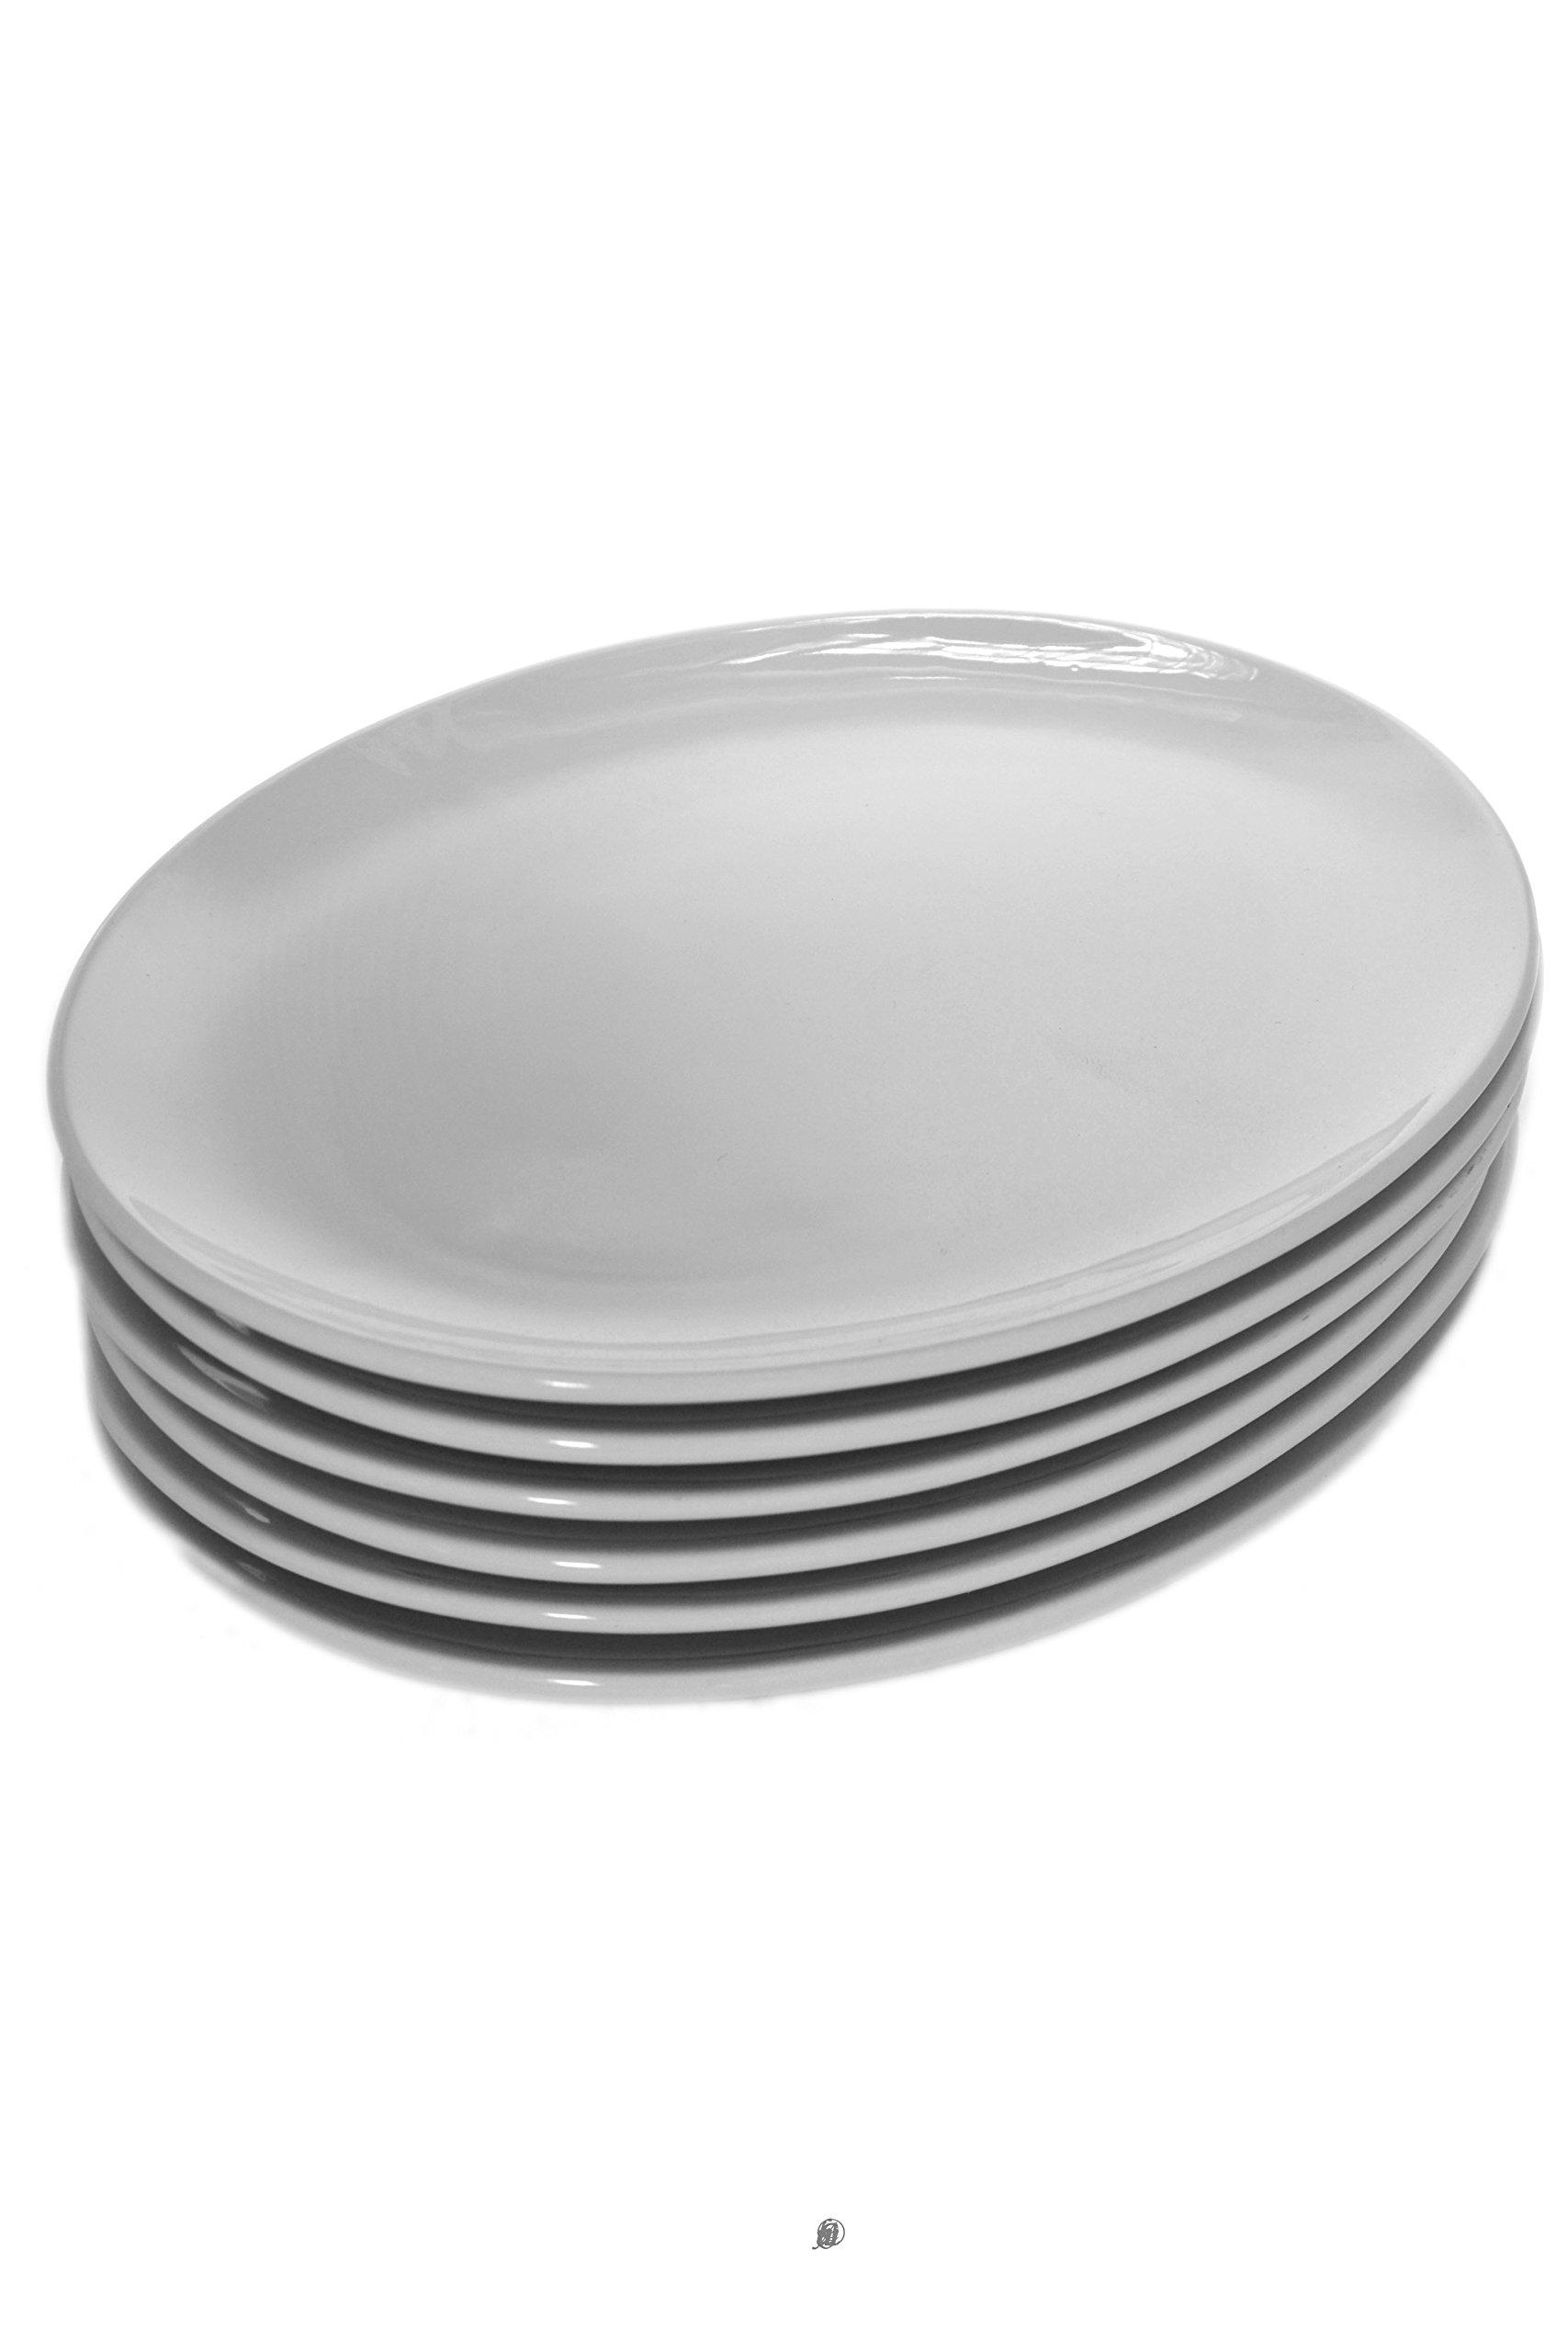 Set of 12 Oval White Porcelain Sushi Appetizer Plates